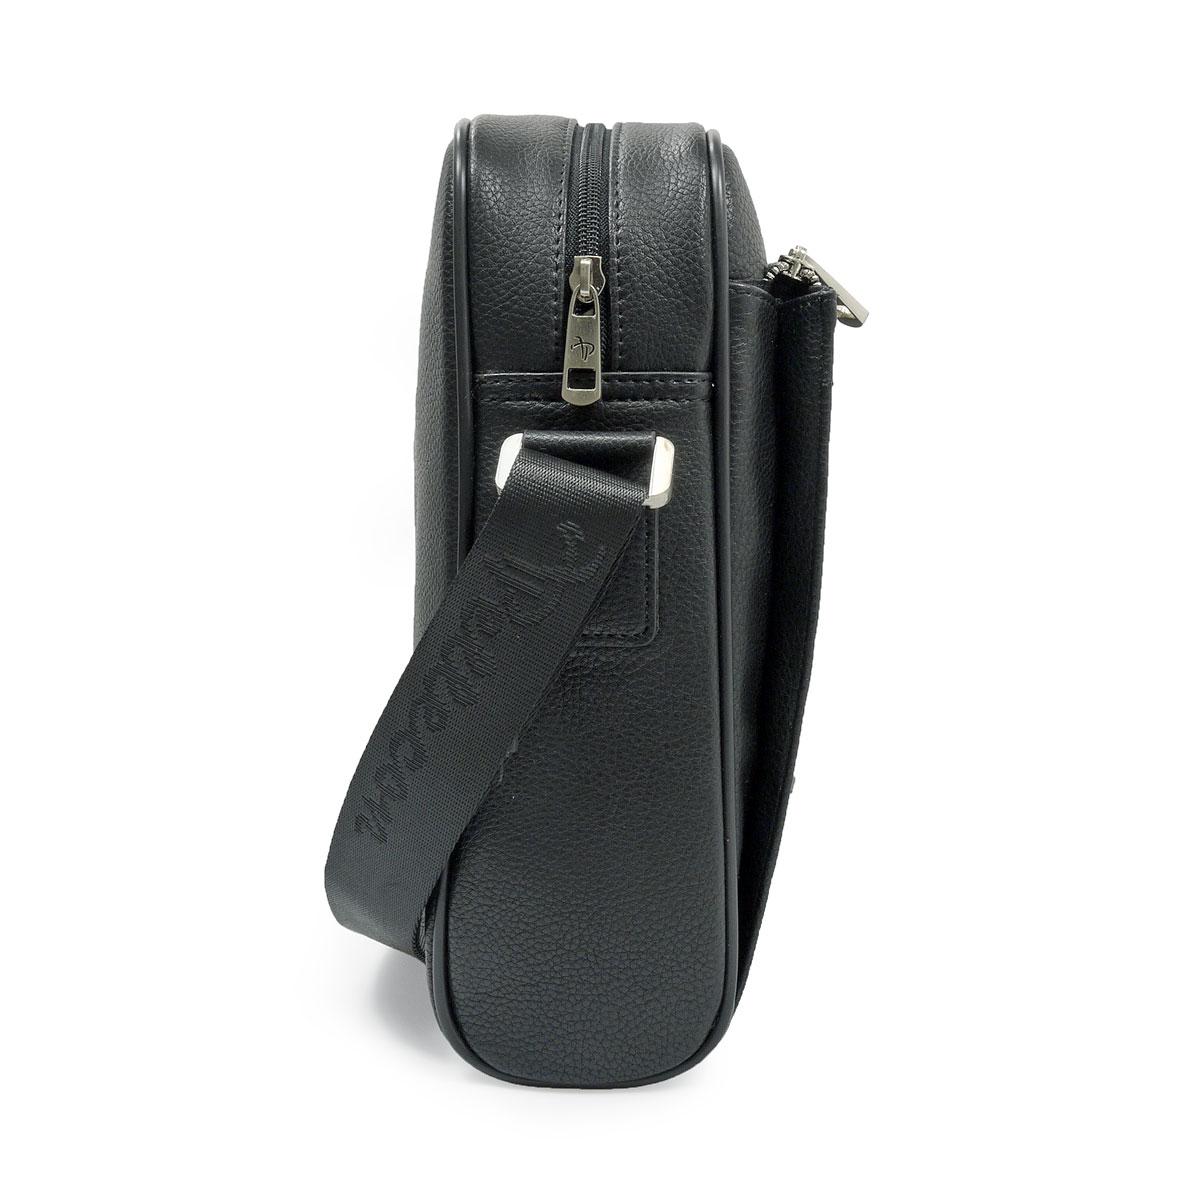 812-21387-1 Men's Bag Pellekon